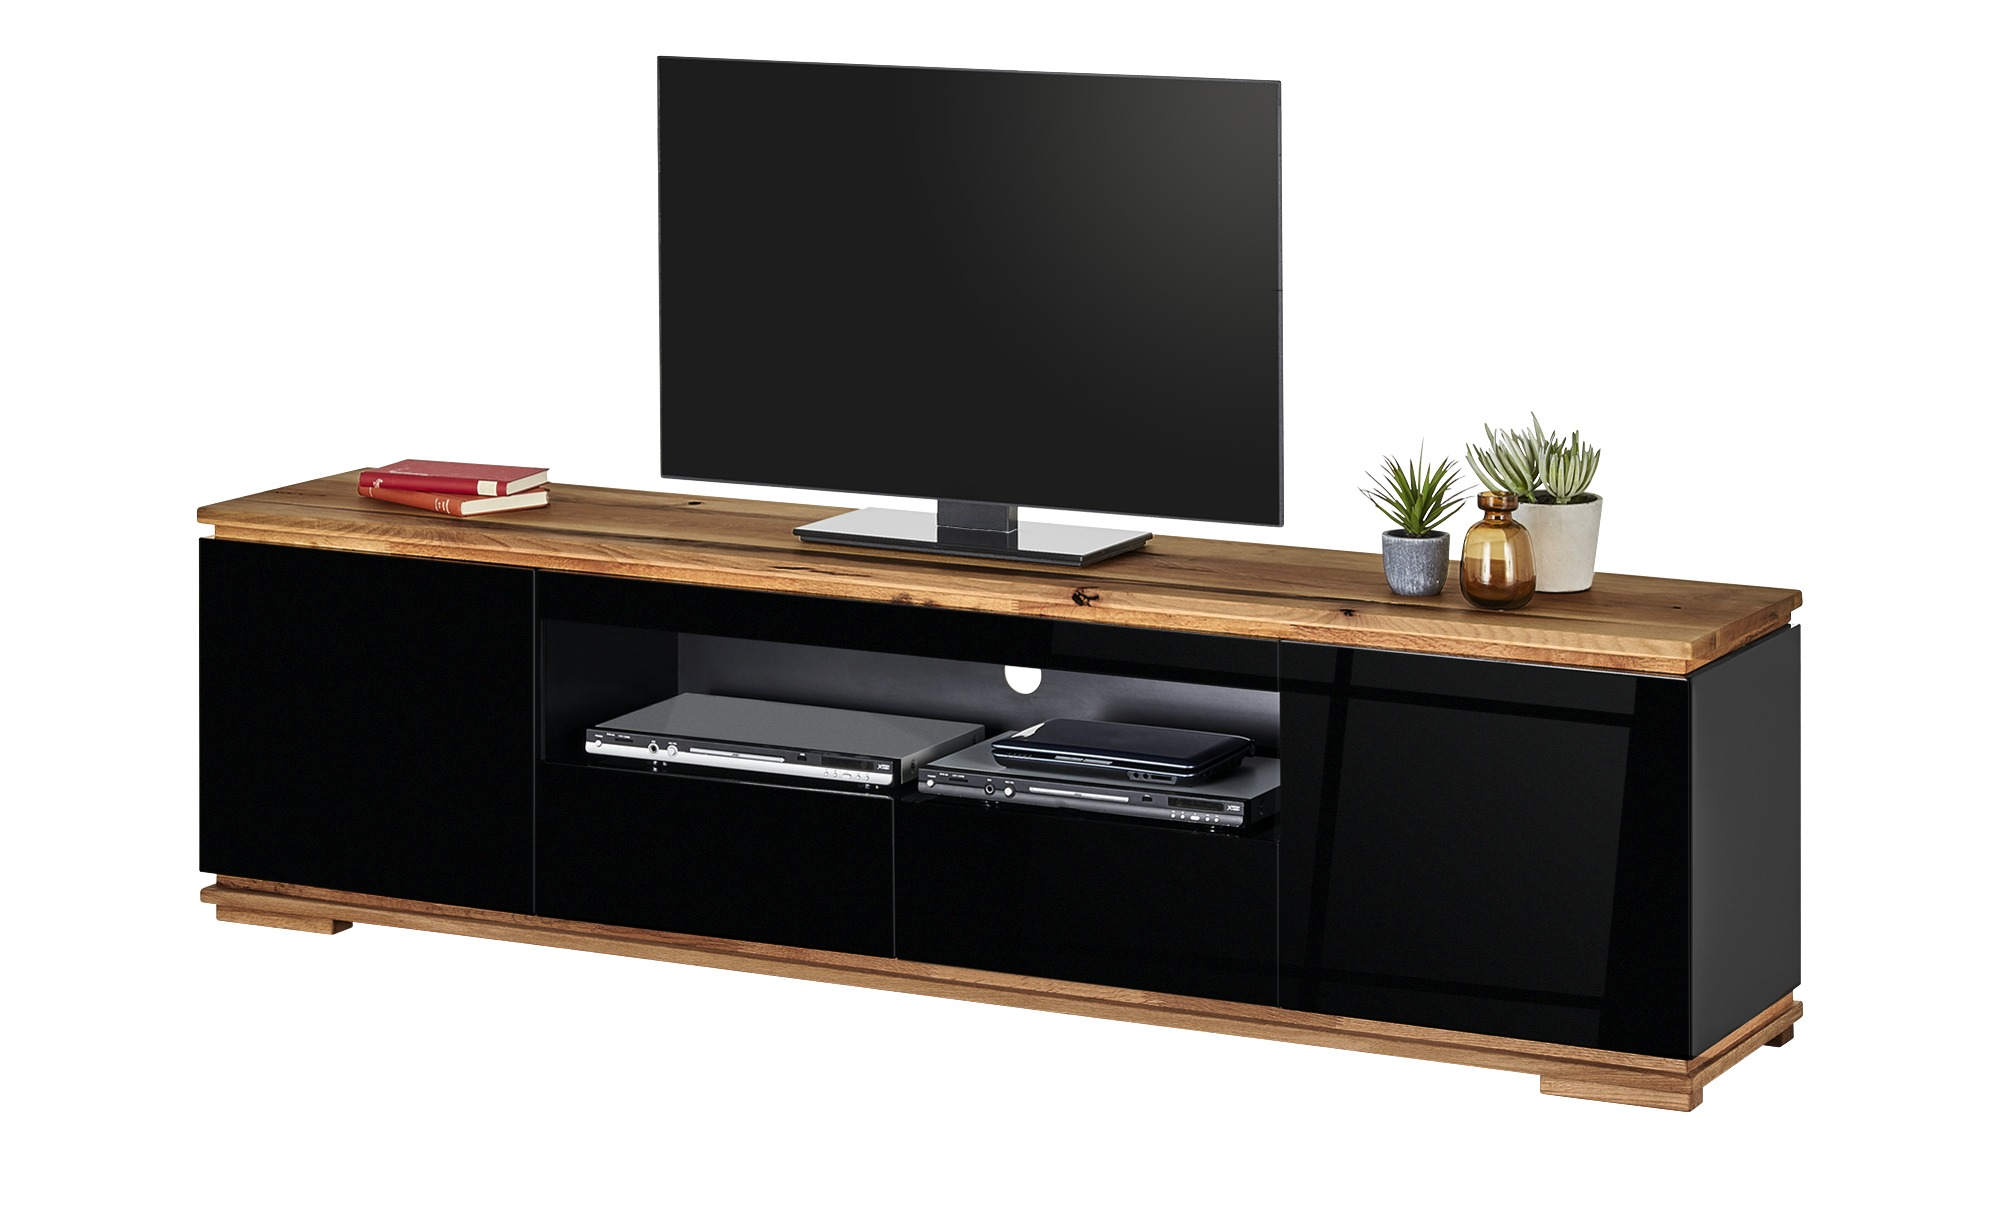 TV-Lowboard  Messina ¦ schwarz ¦ Maße (cm): B: 202 H: 54 T: 40 TV- & Media Möbel > TV-Racks - Höffner